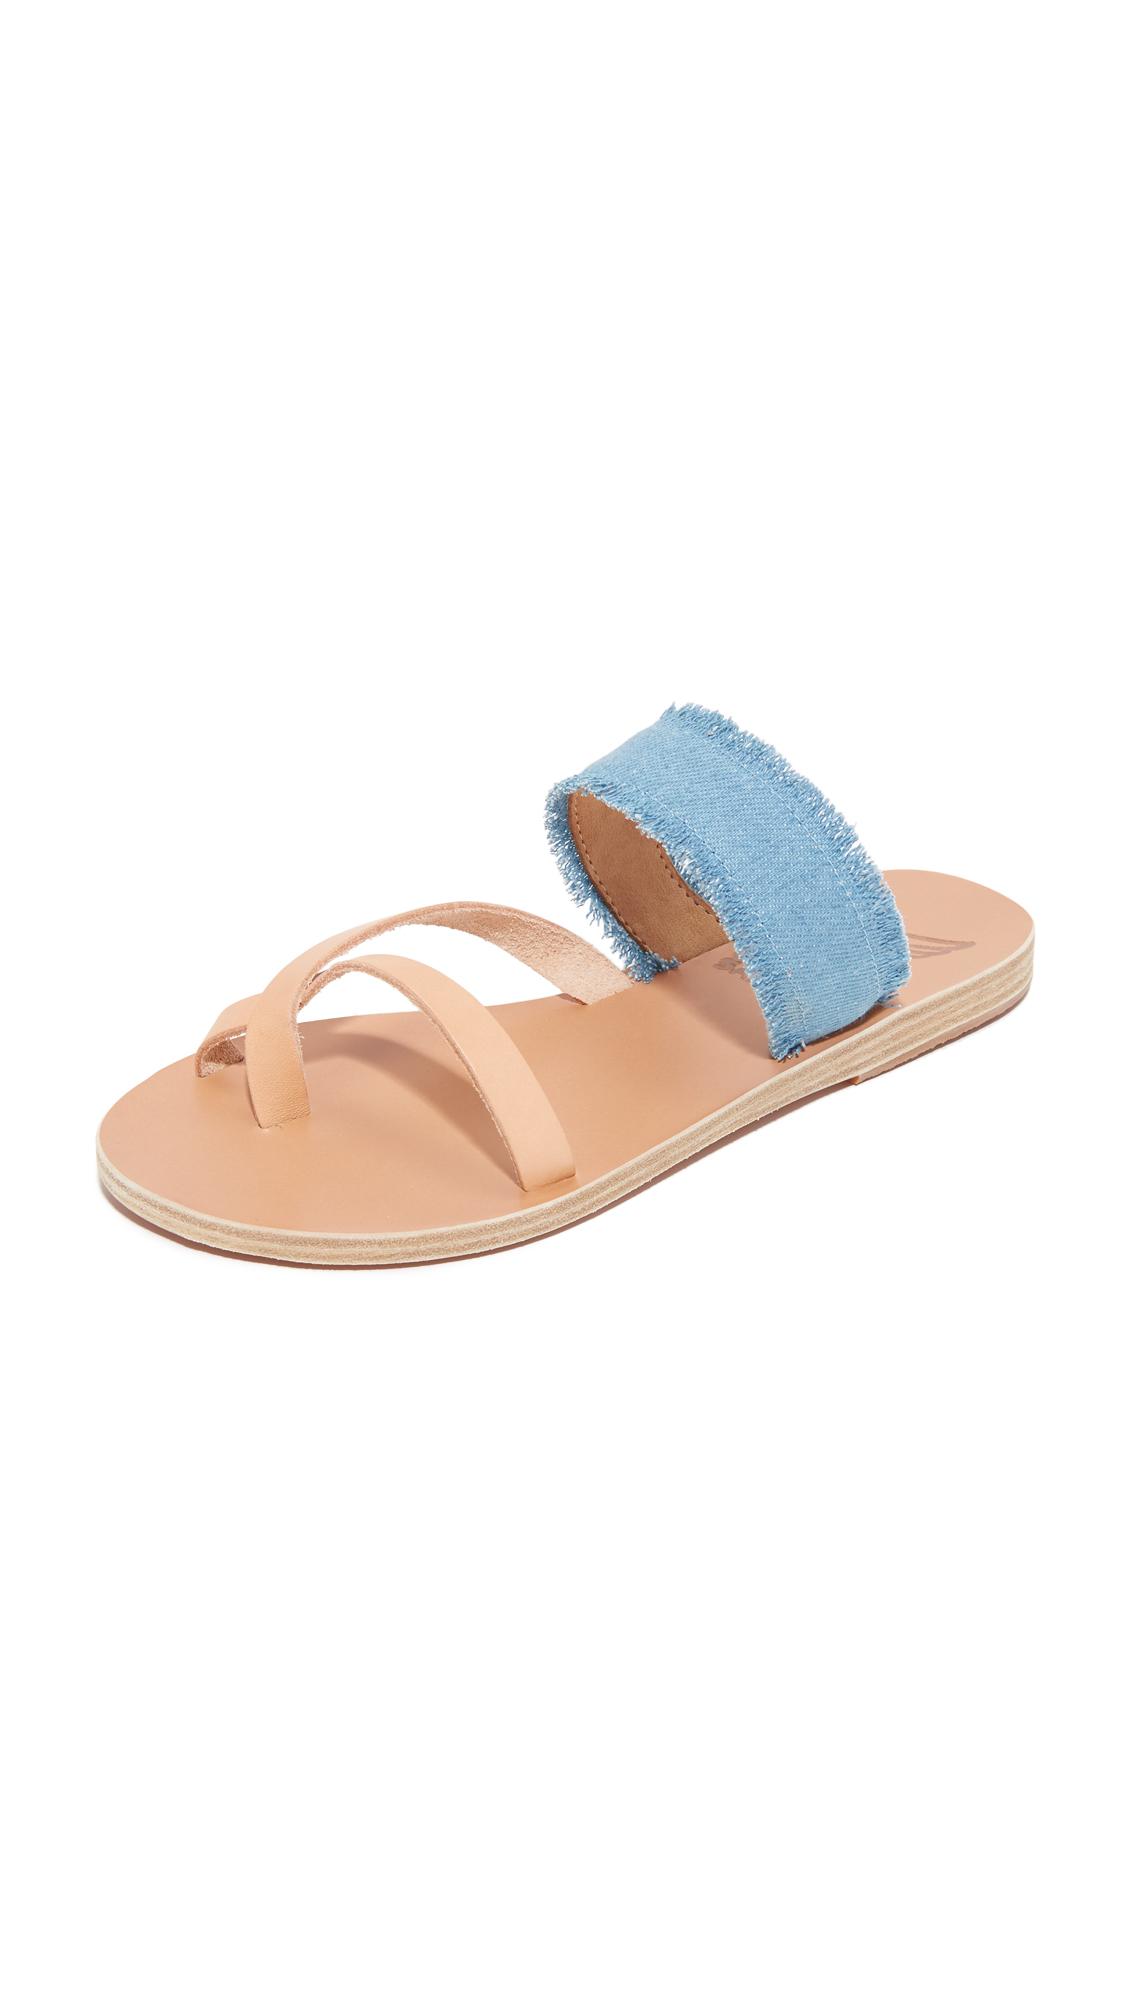 Ancient Greek Sandals Daphnae Sandals - Light Denim